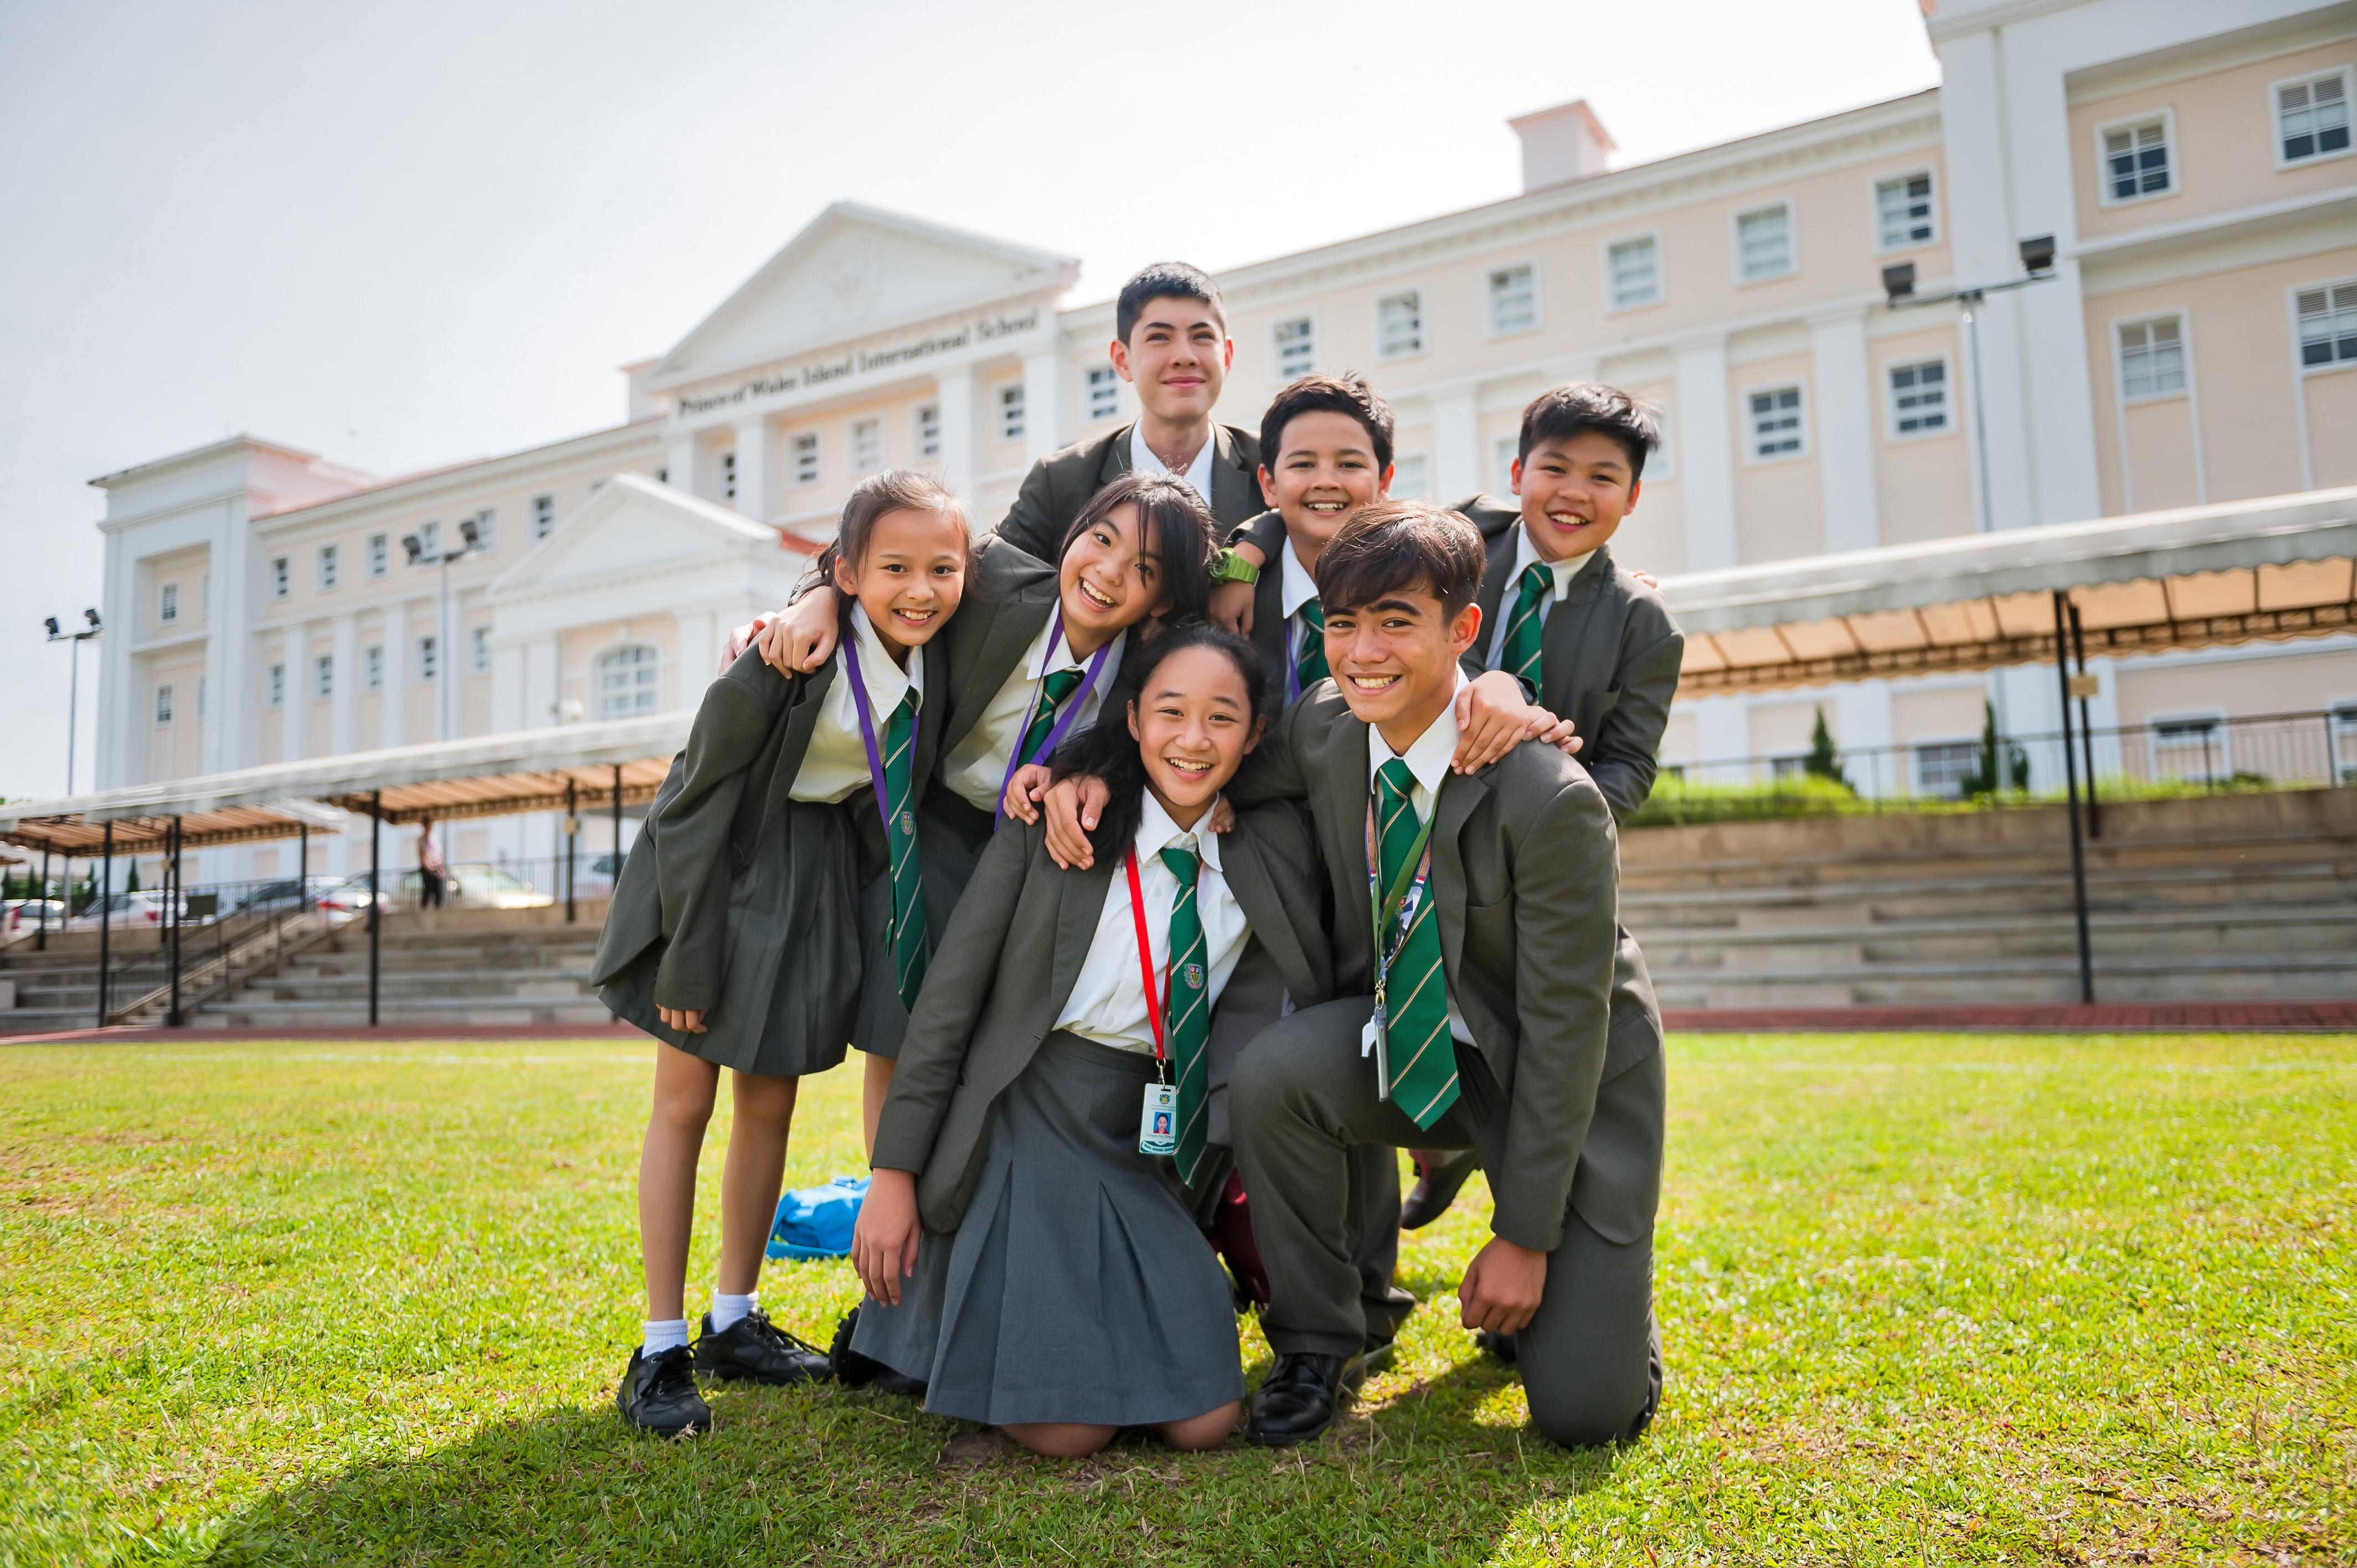 Council of British International Schools (COBIS): COBIS